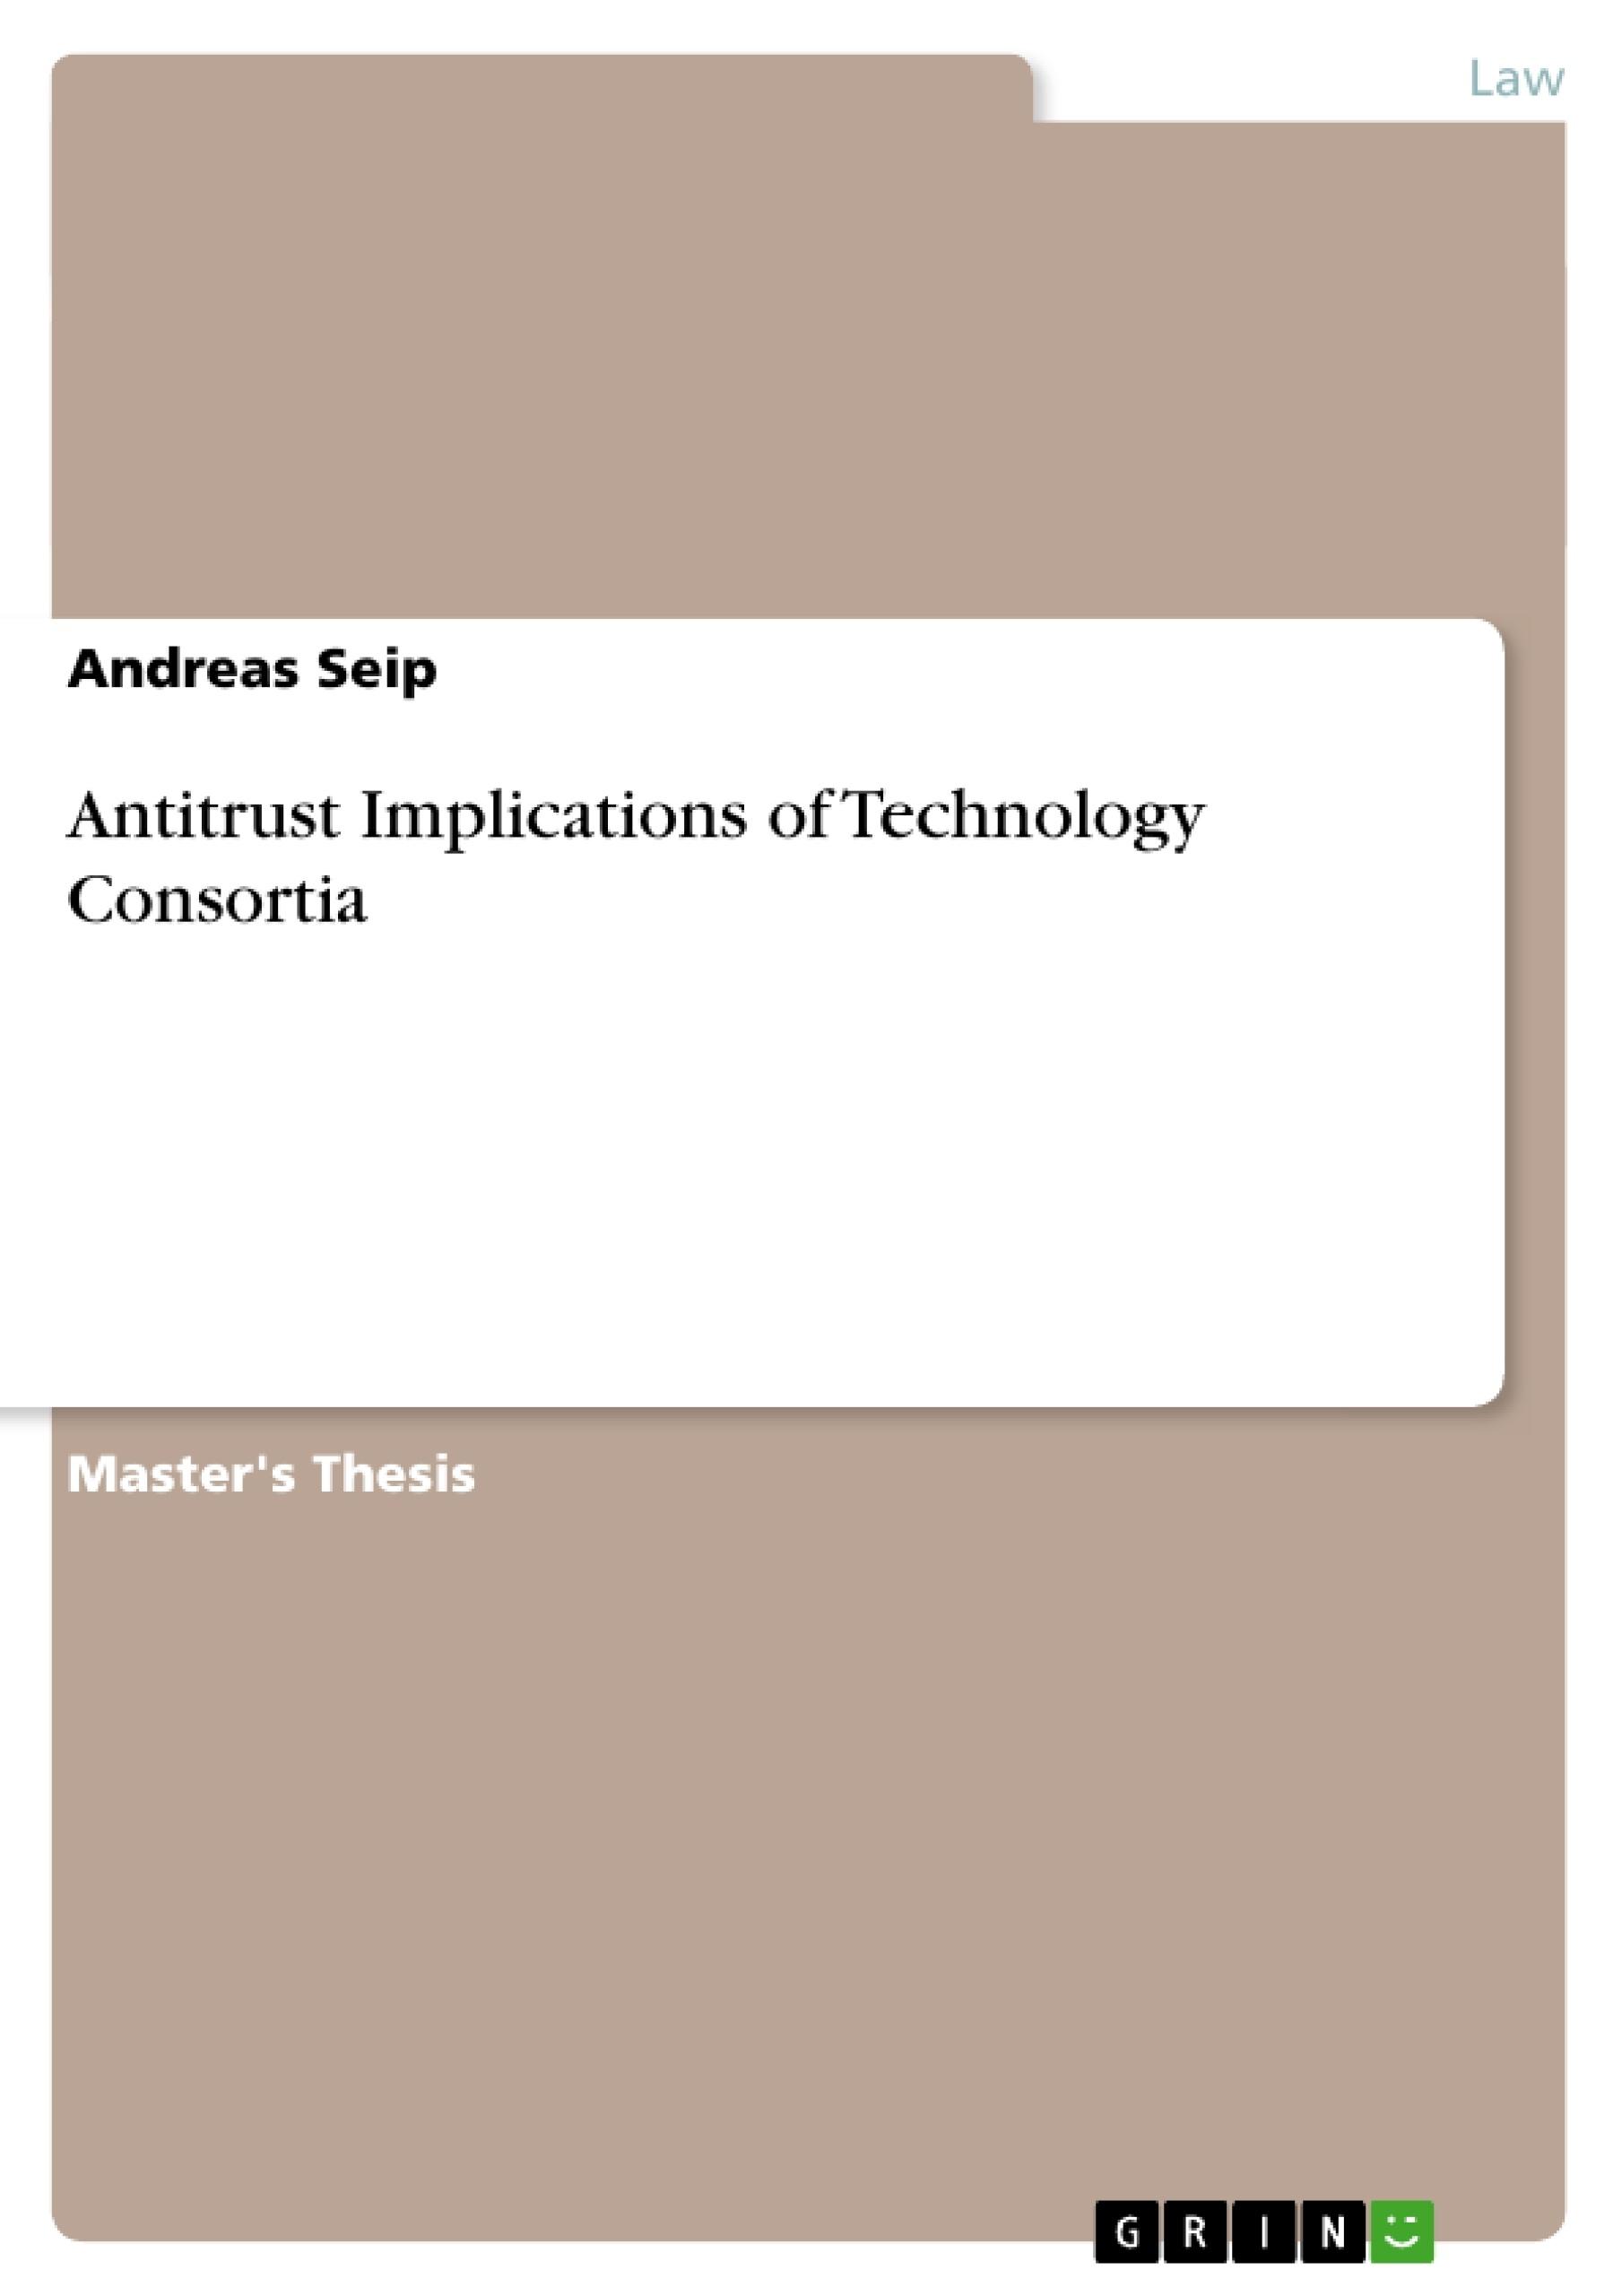 Title: Antitrust Implications of Technology Consortia